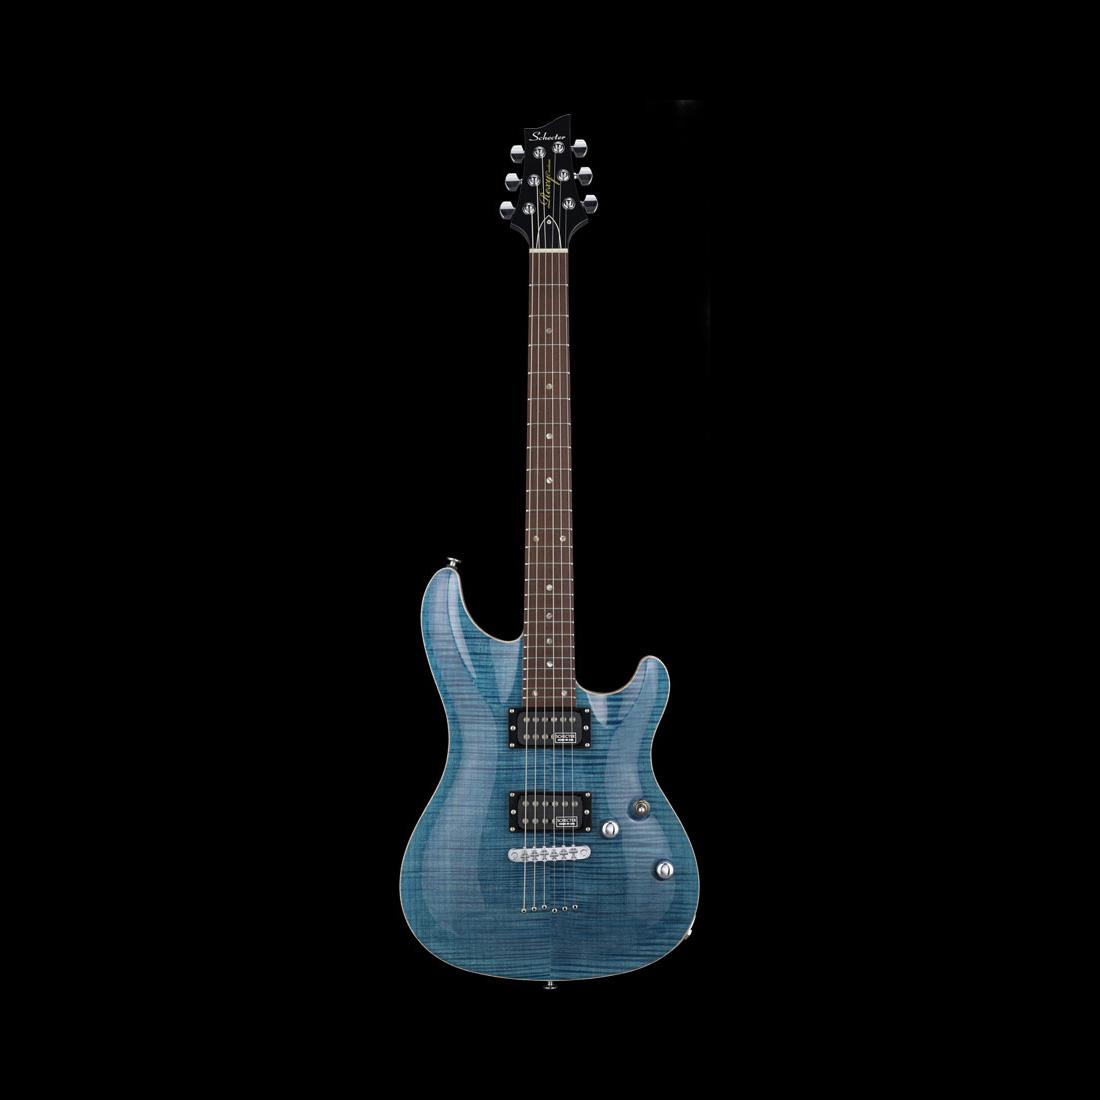 Schecter / RX-2-24-CTM-TOM Caelum Blue シェクター エレキギター 《完全受注生産:予約受付中》